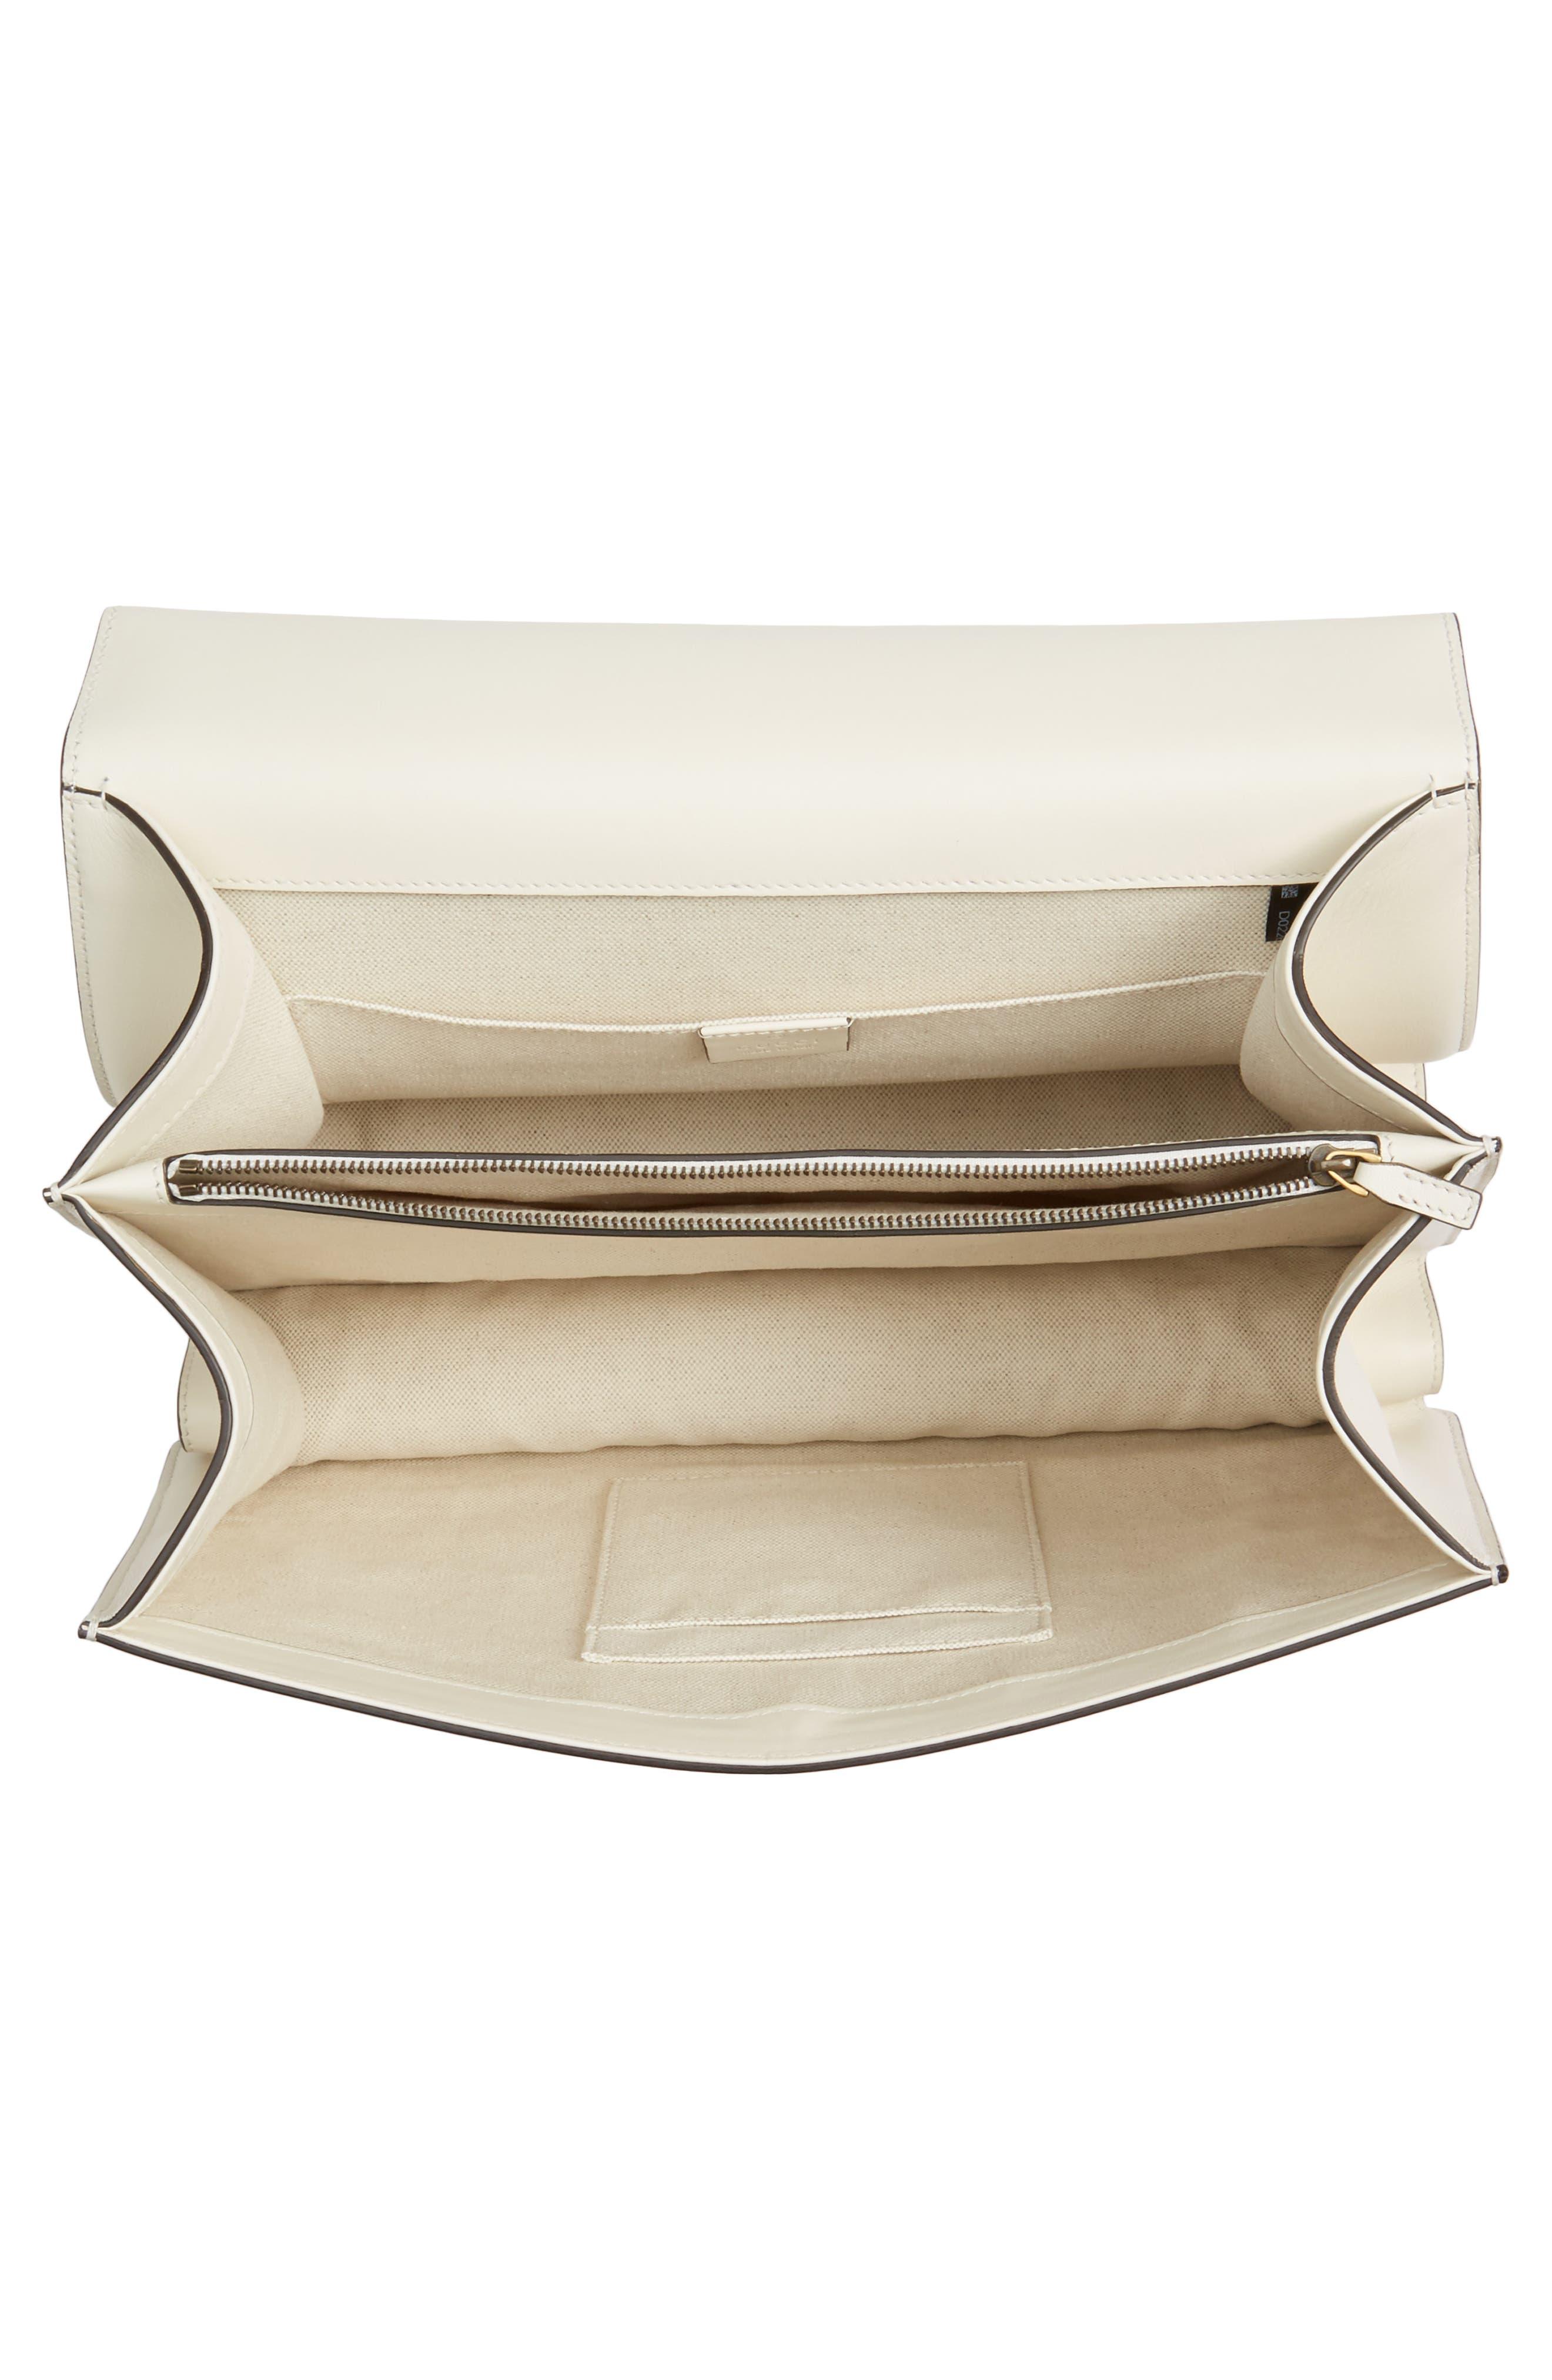 Large Dionysus Top Handle Leather Shoulder Bag,                             Alternate thumbnail 4, color,                             Mystic White/ Blue/ Red